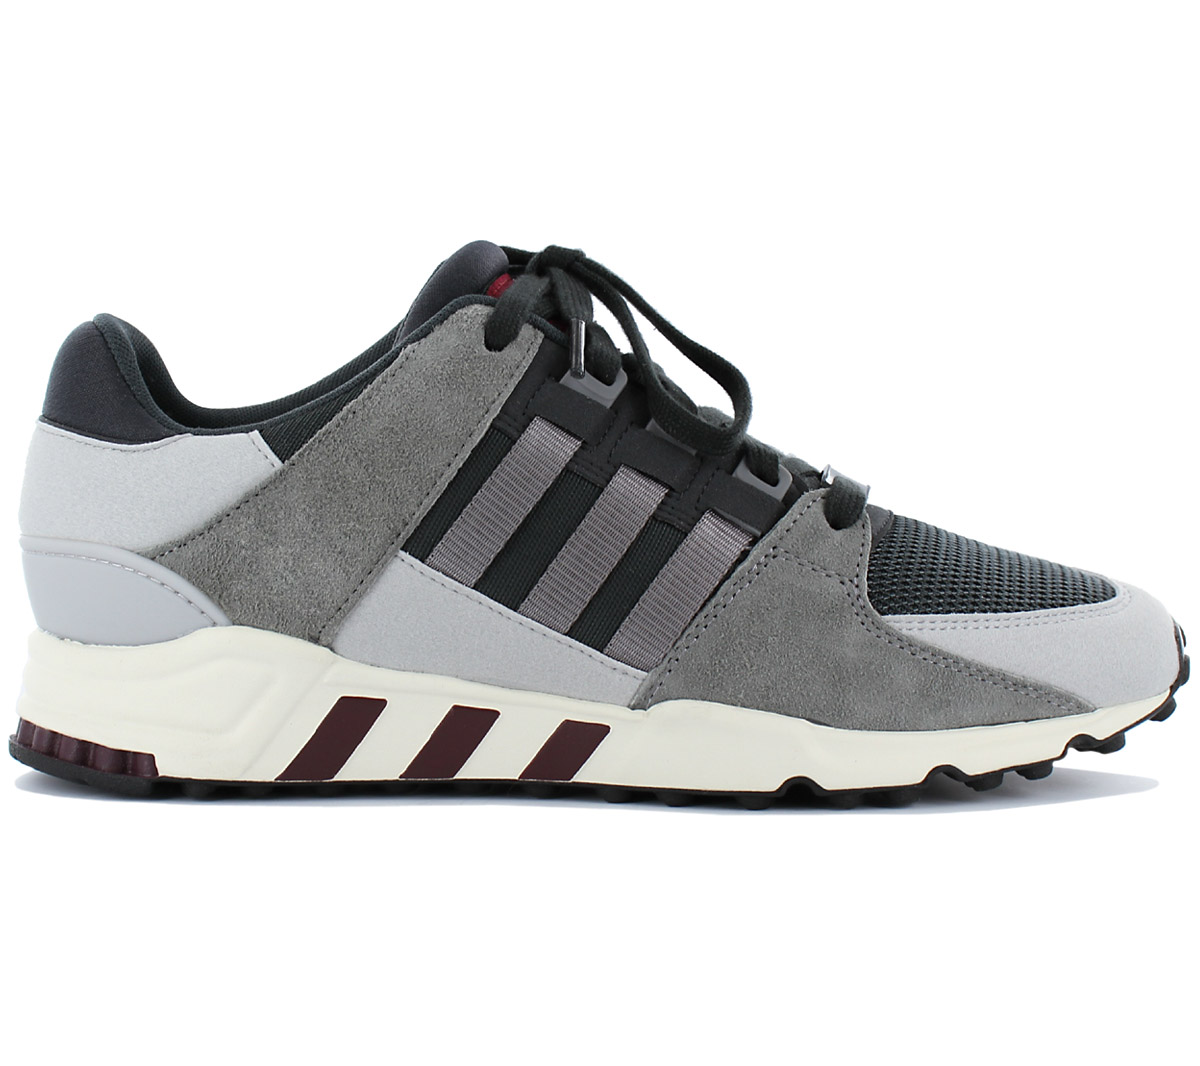 adidas Herren Sneaker 700 Schuhe Freizeit Turnschuhe ZX 750 700 Sneaker Equipment Support ffab5f